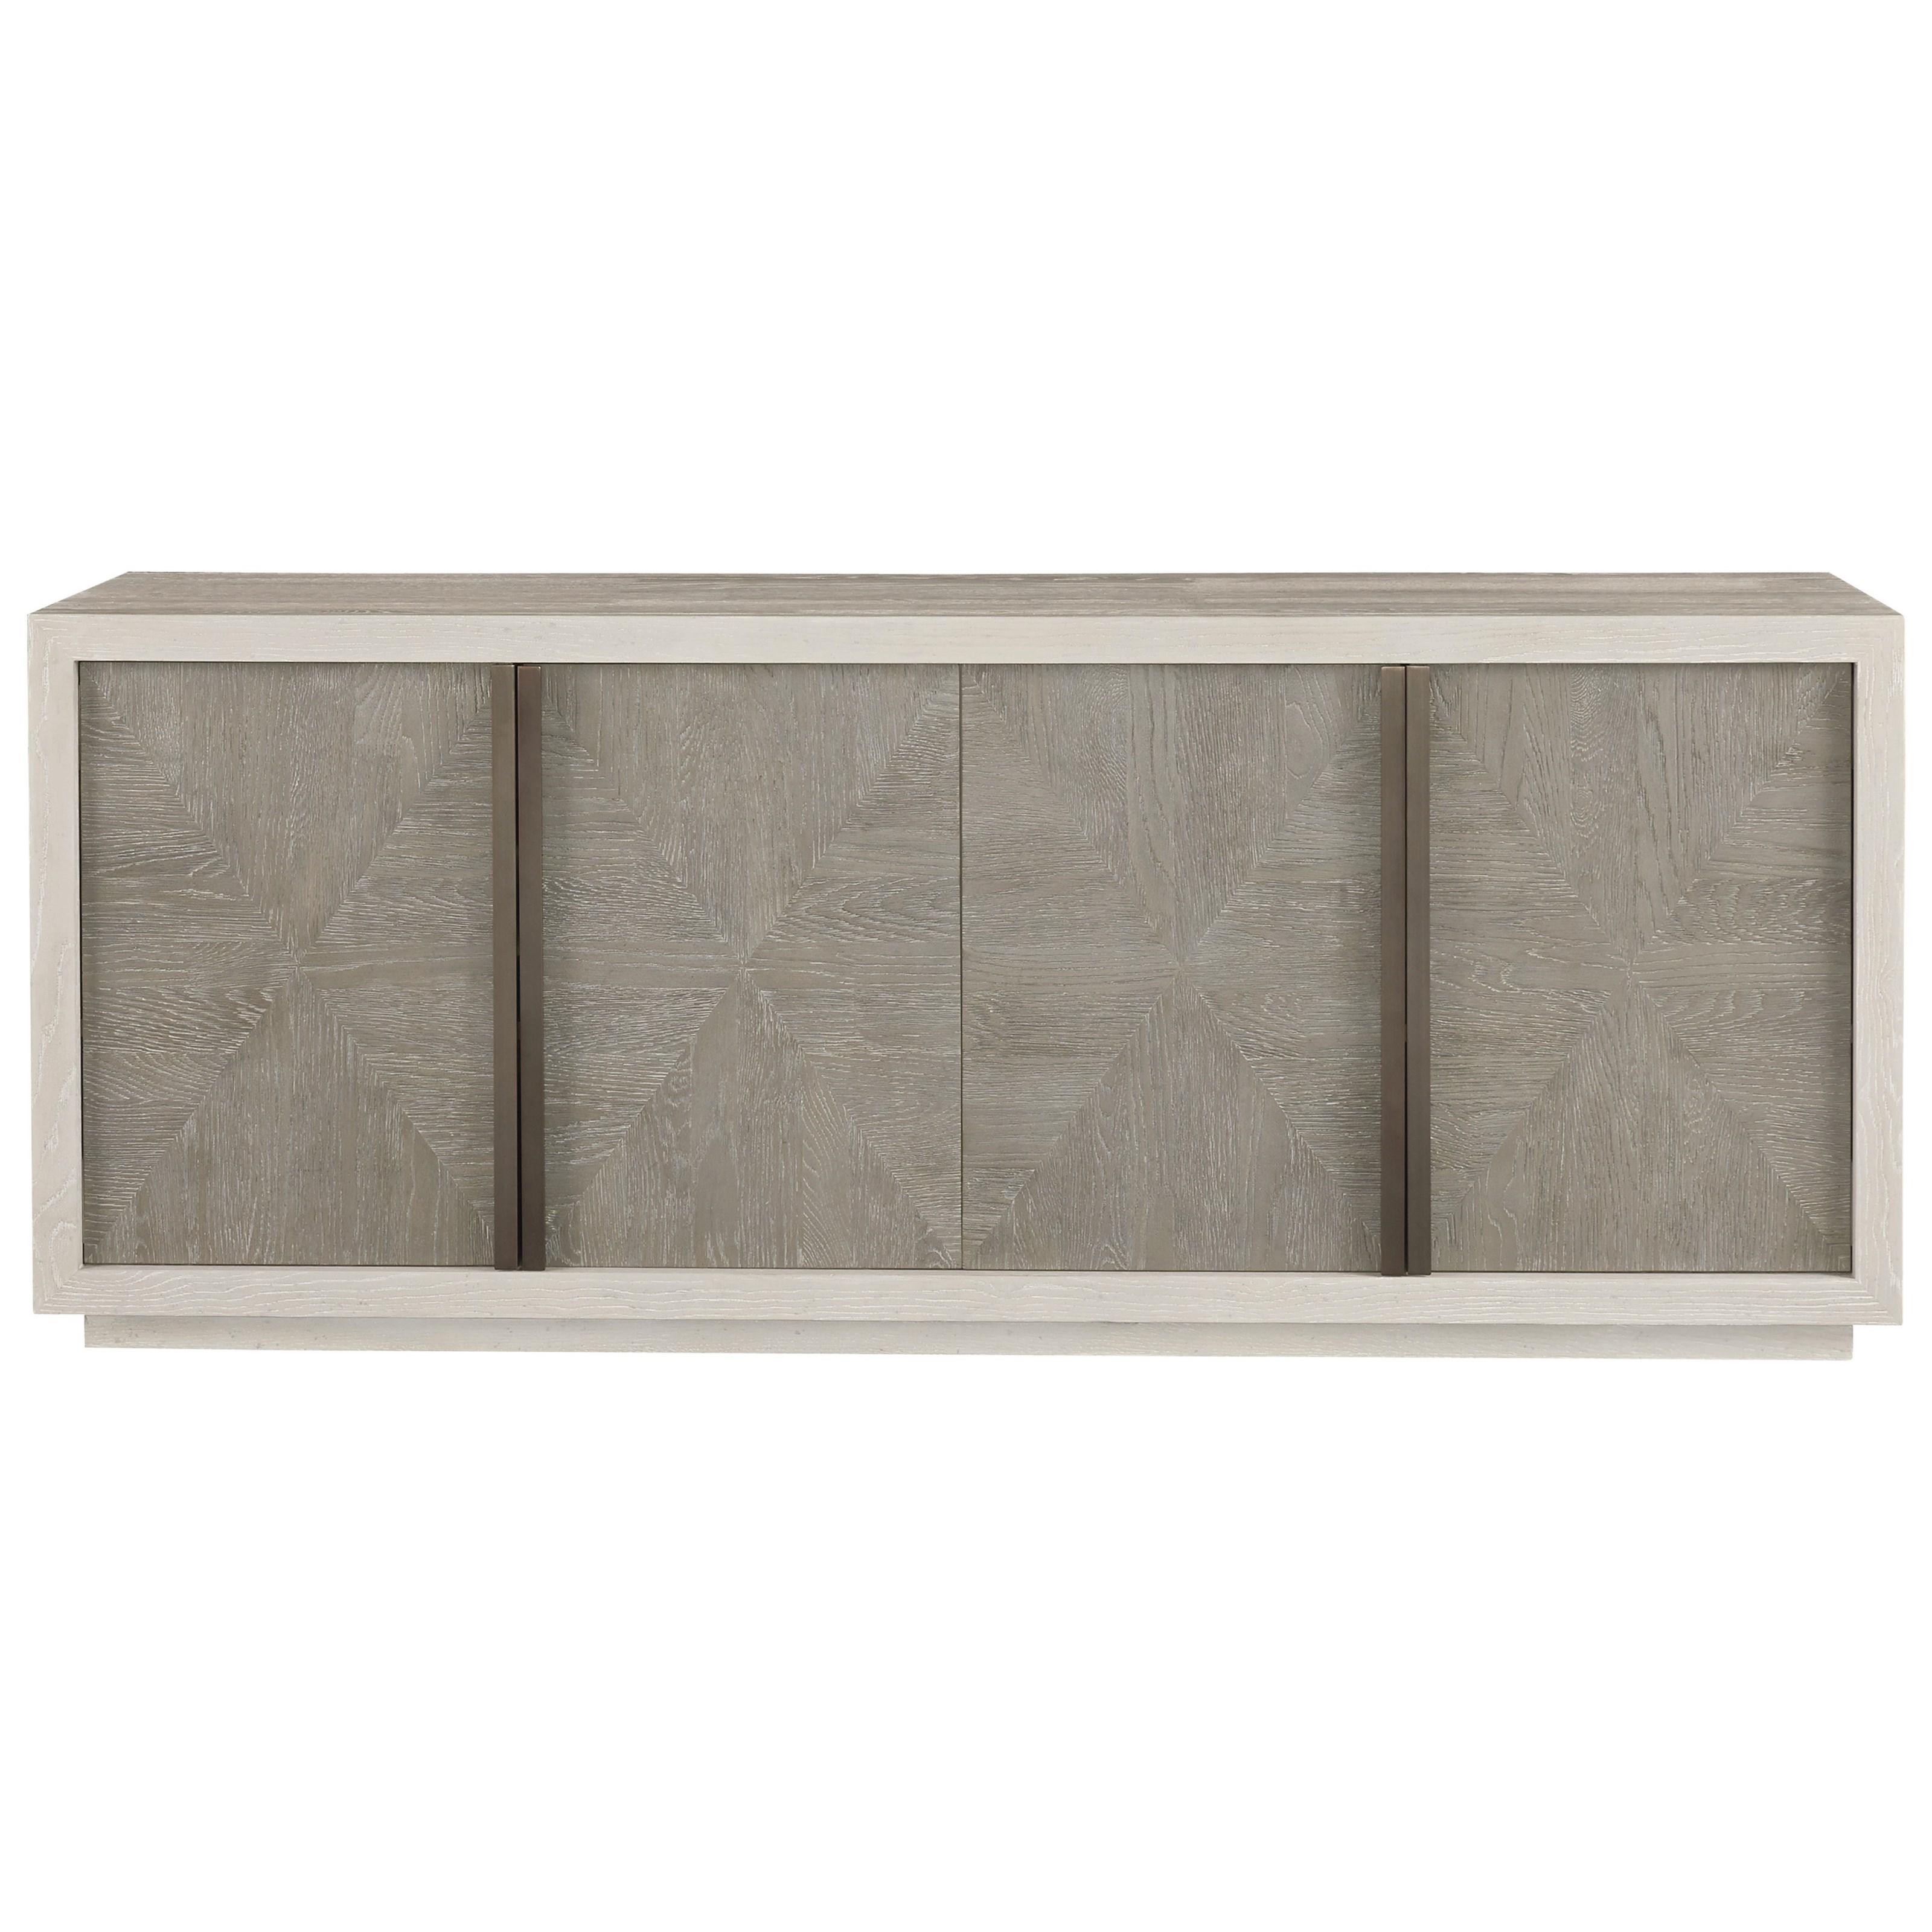 Modern Brinkley Credenza by Universal at Baer's Furniture